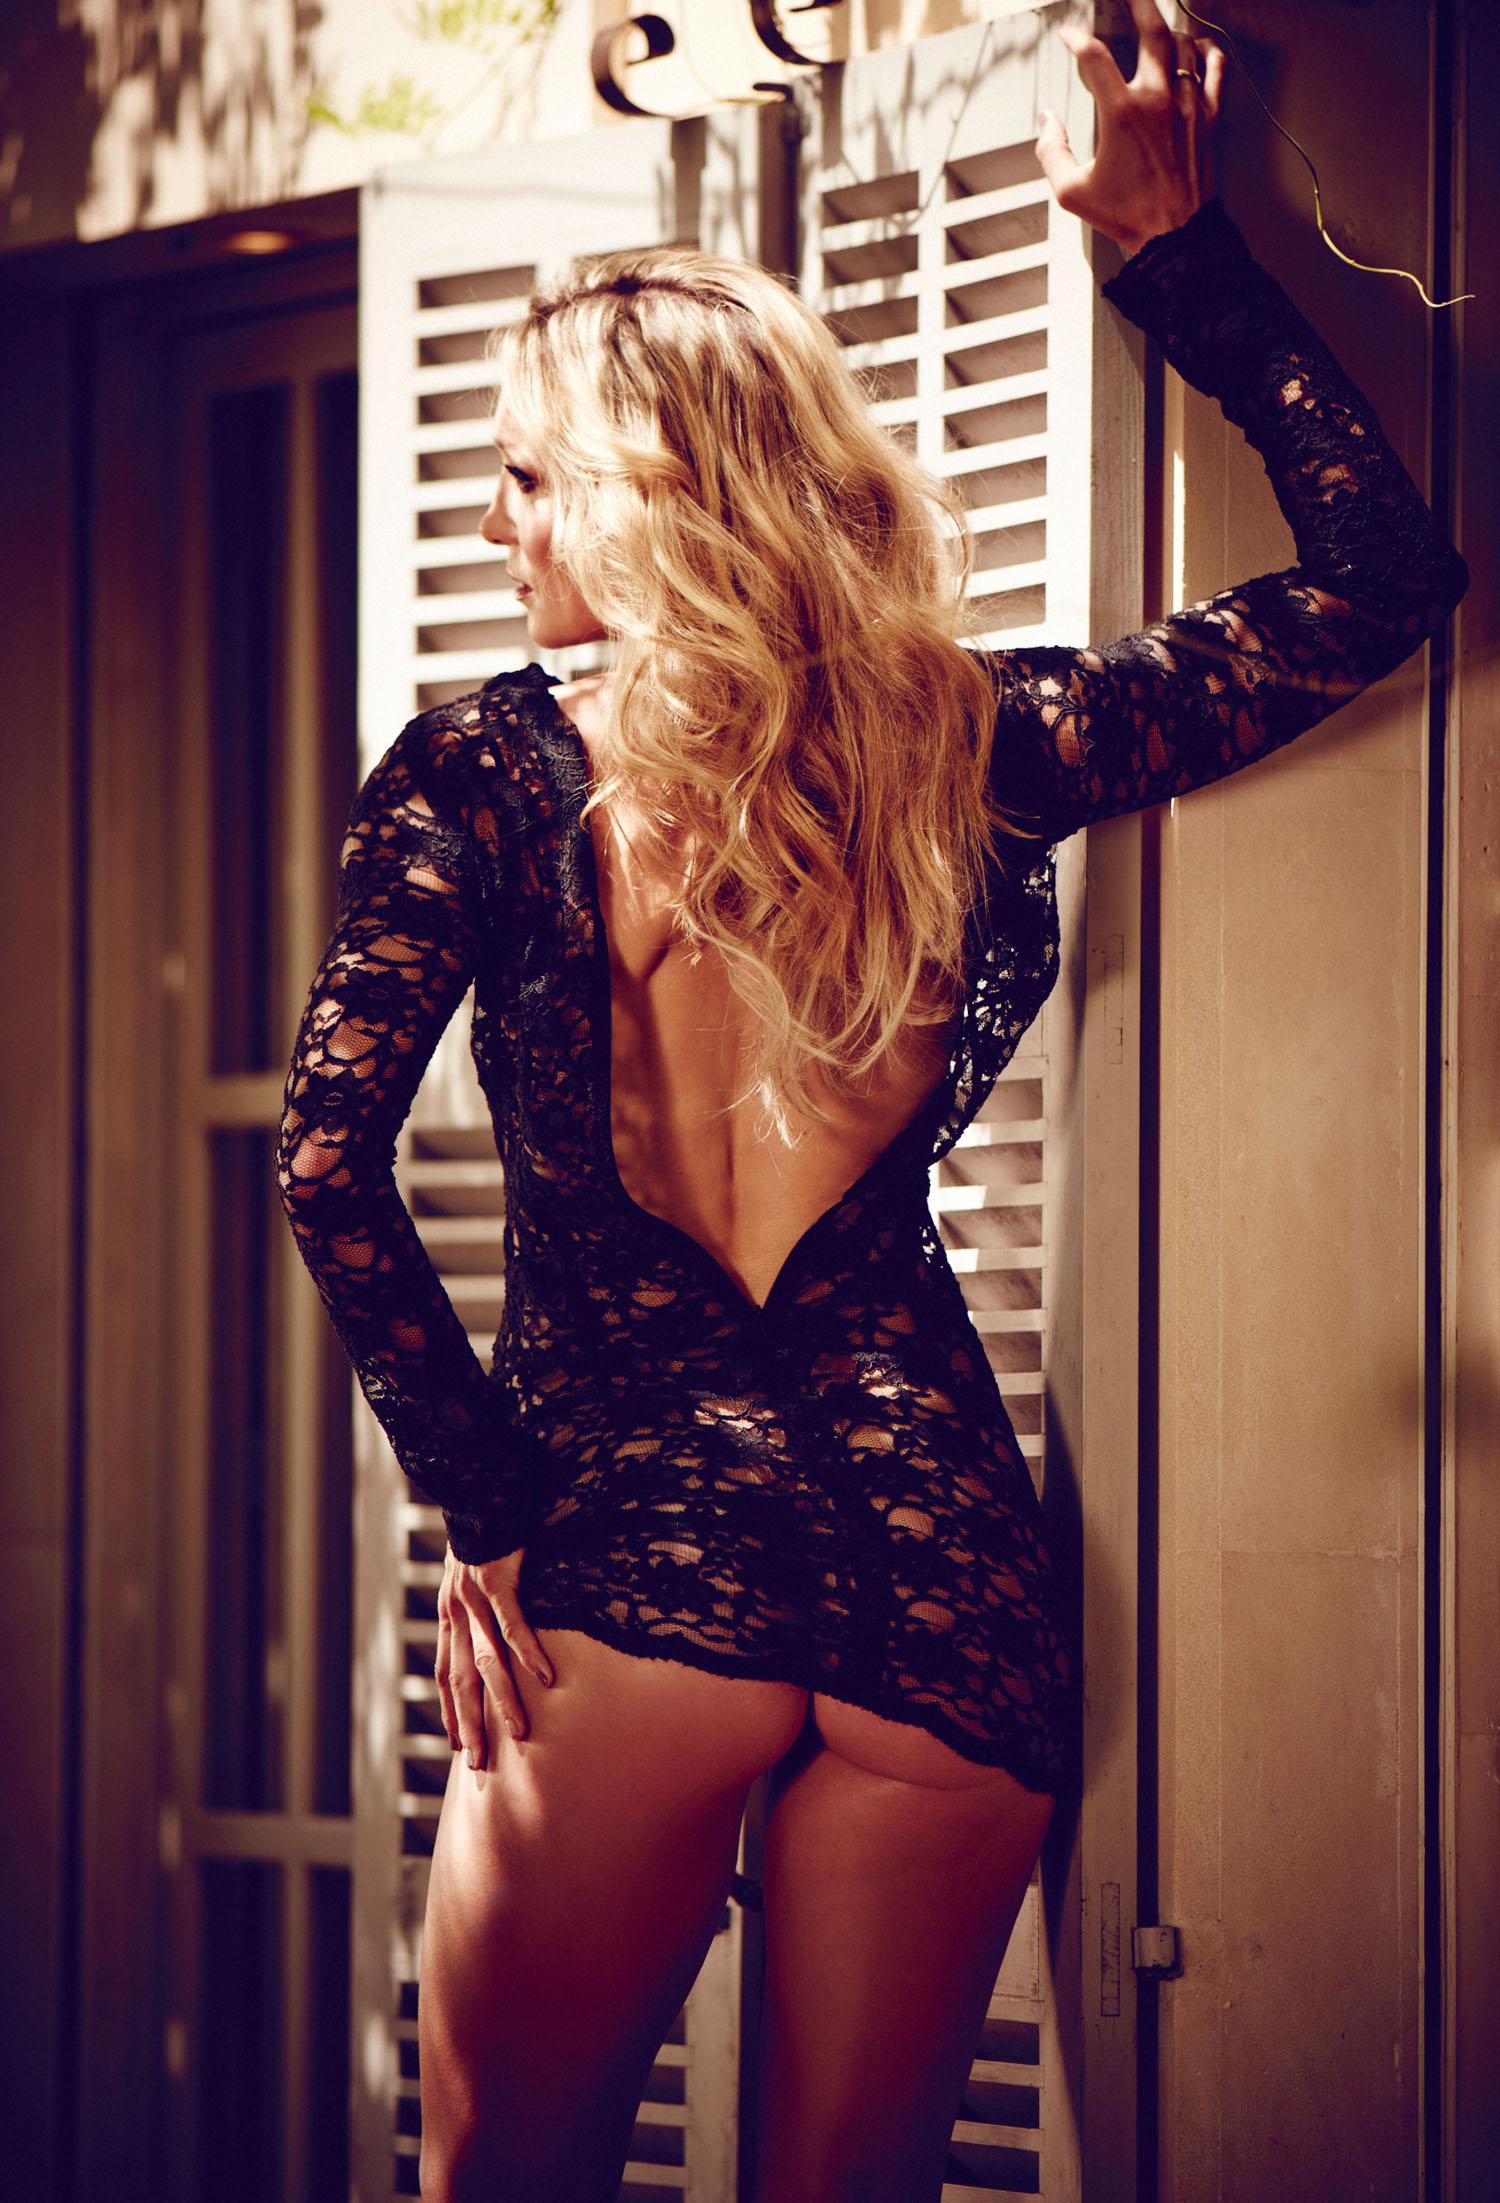 Кристин Тэйсс голая. Фото - 55